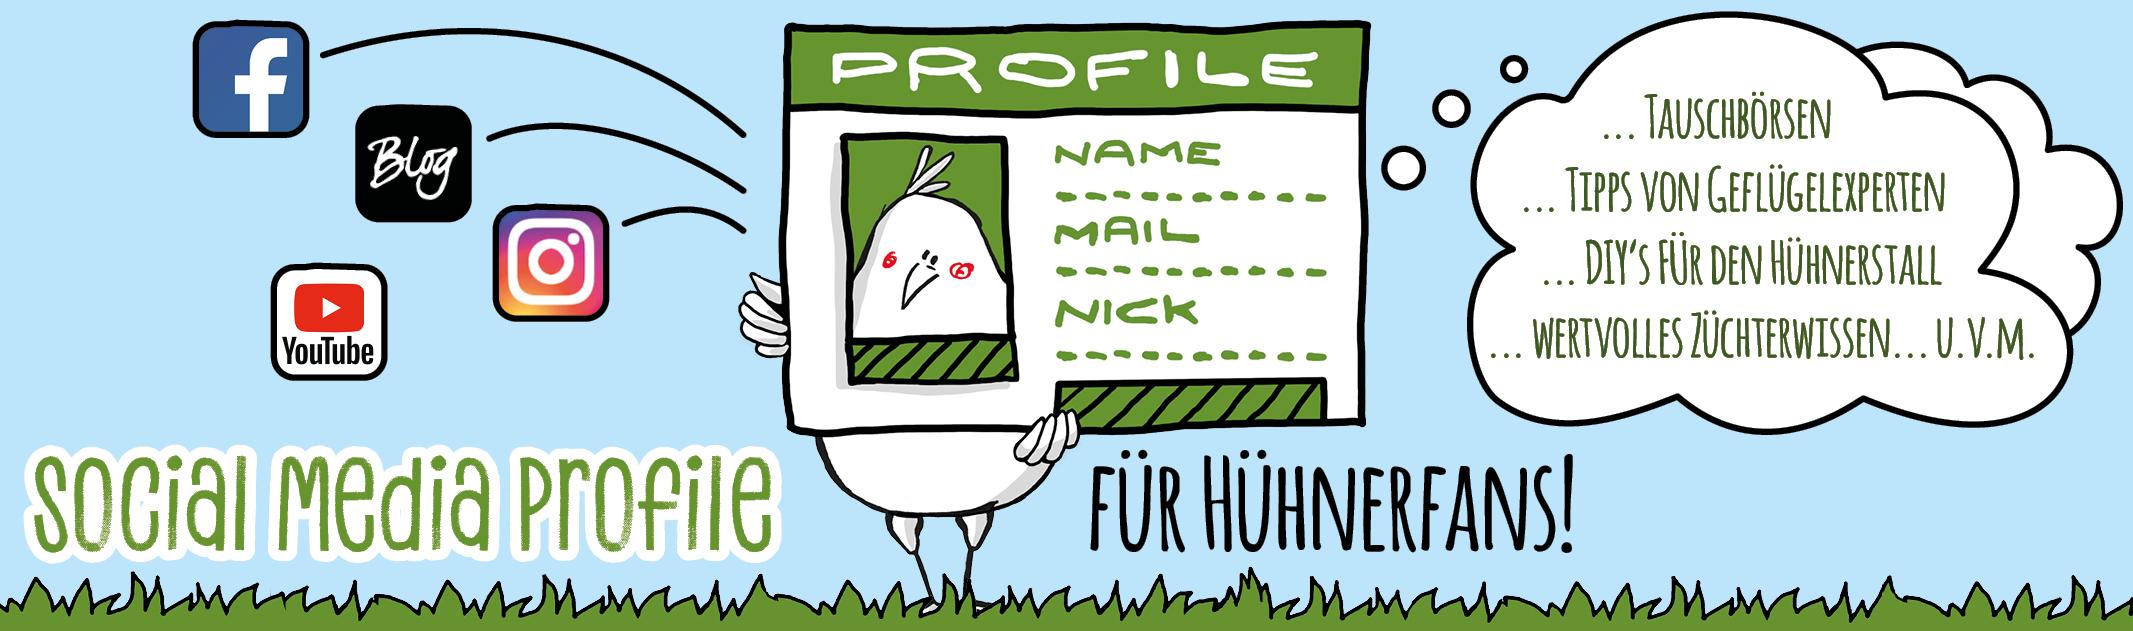 Social Media Profile für Hühnerfans